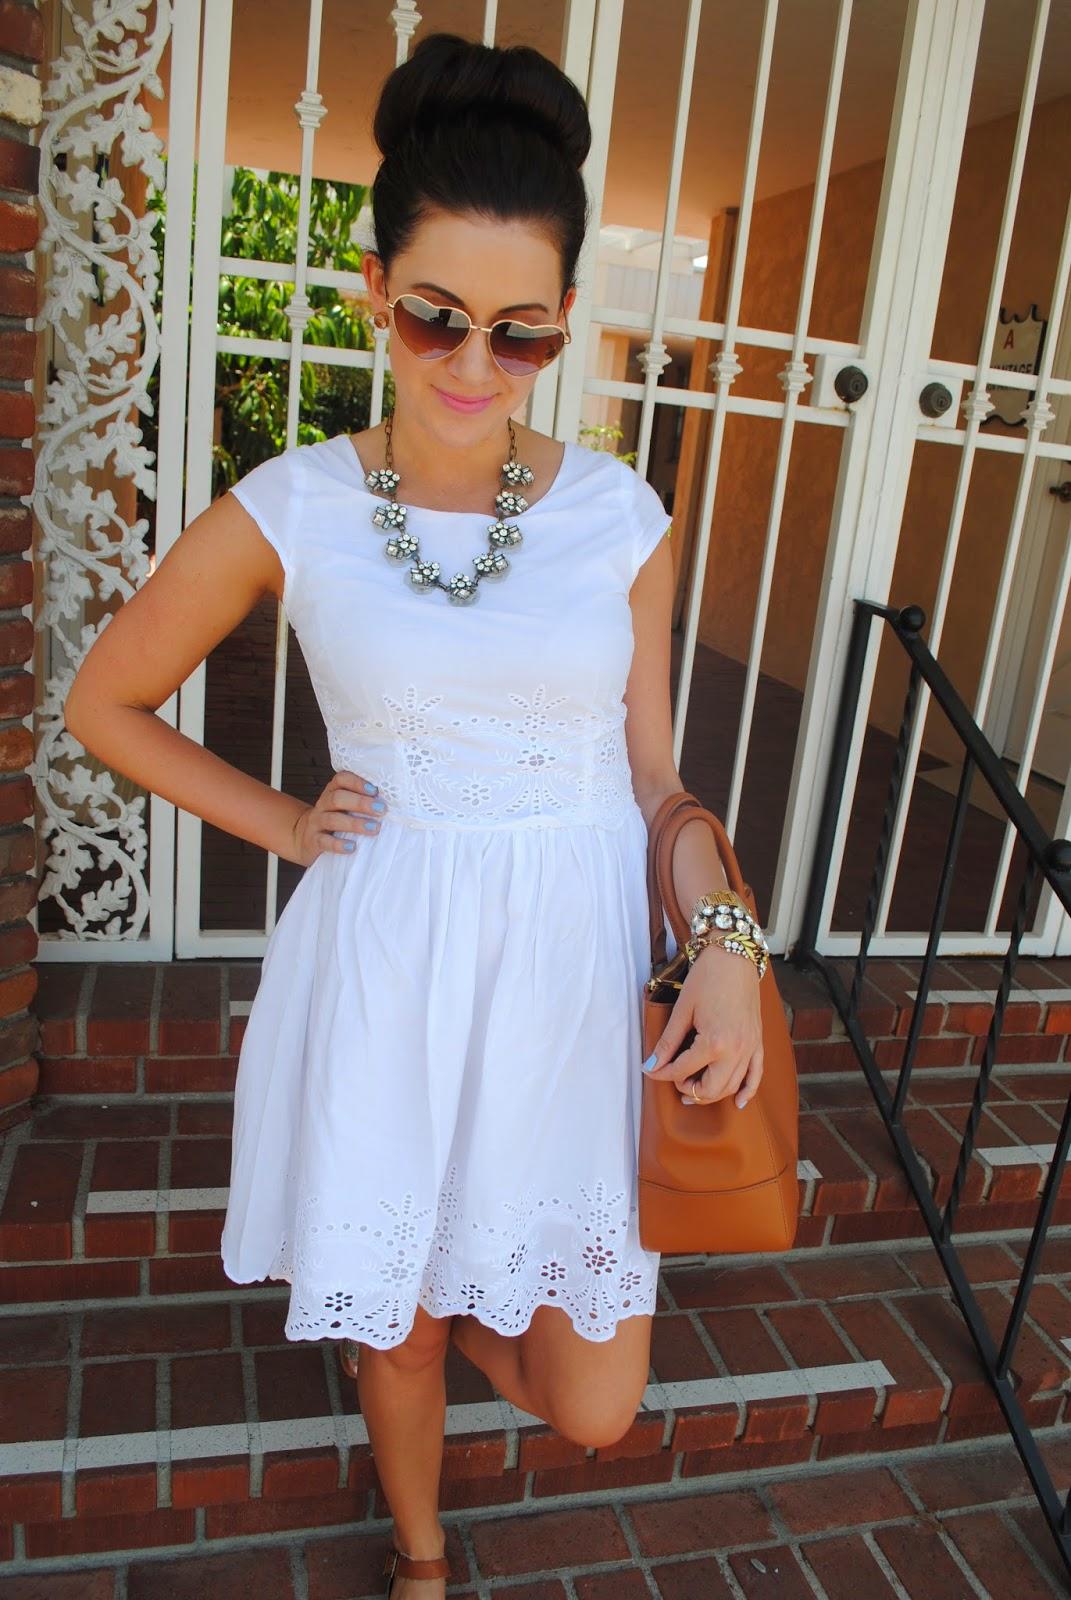 TJ Maxx Summer Dresses